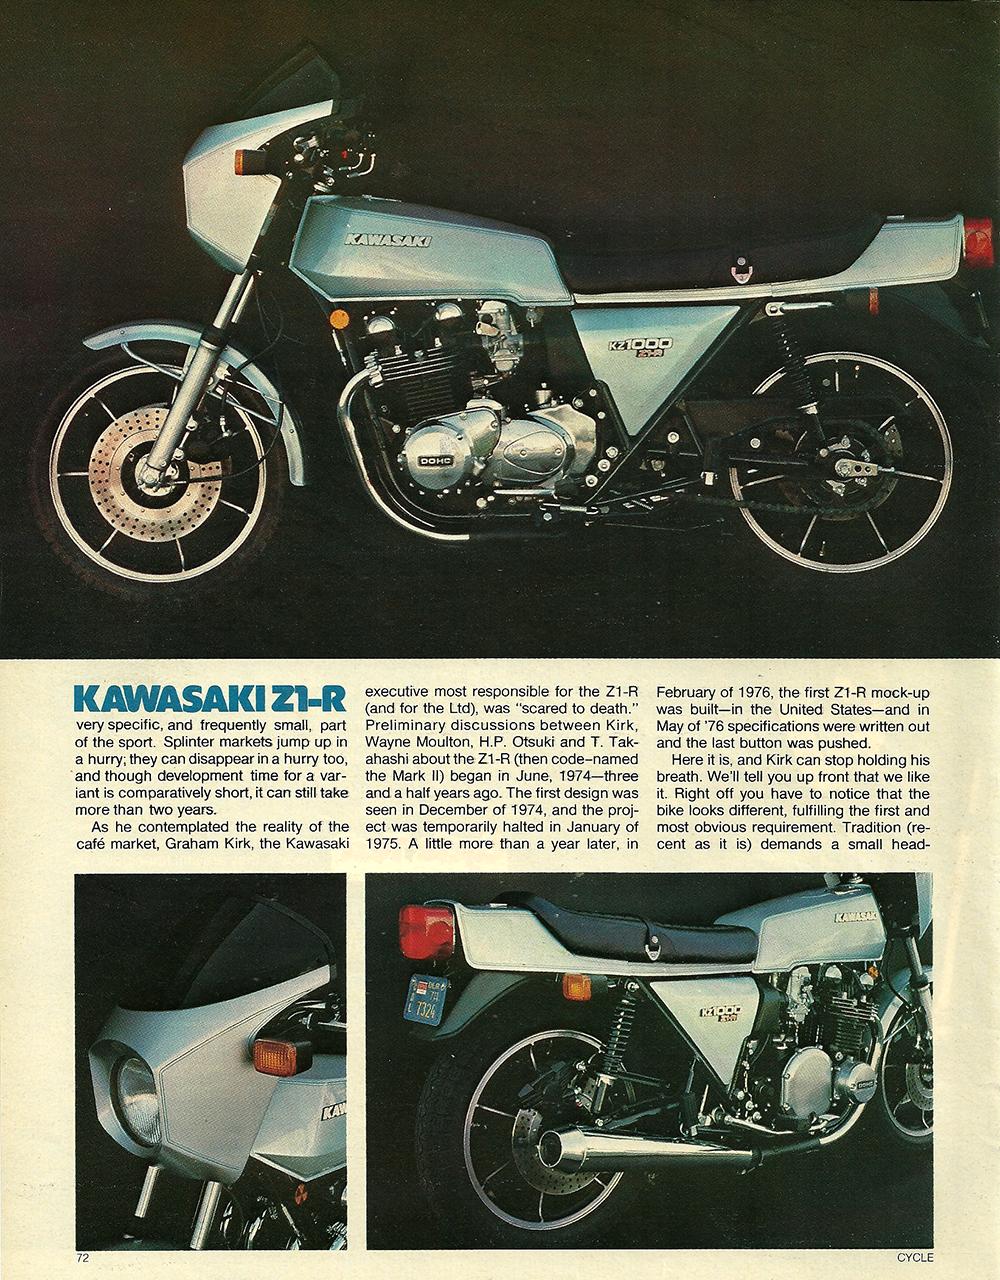 1977 Kawasaki Z1R road test 03.jpg